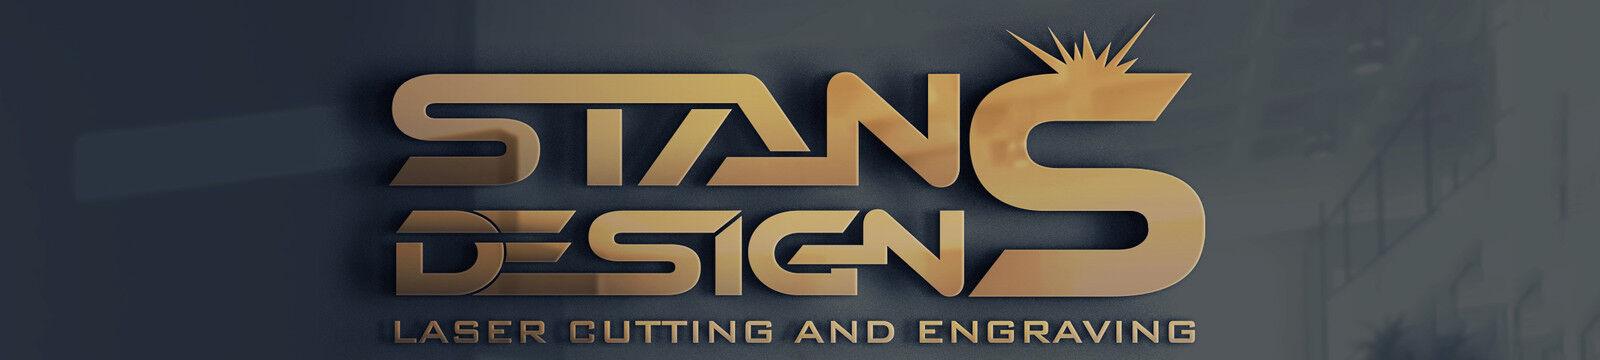 STAN'S DESIGNS